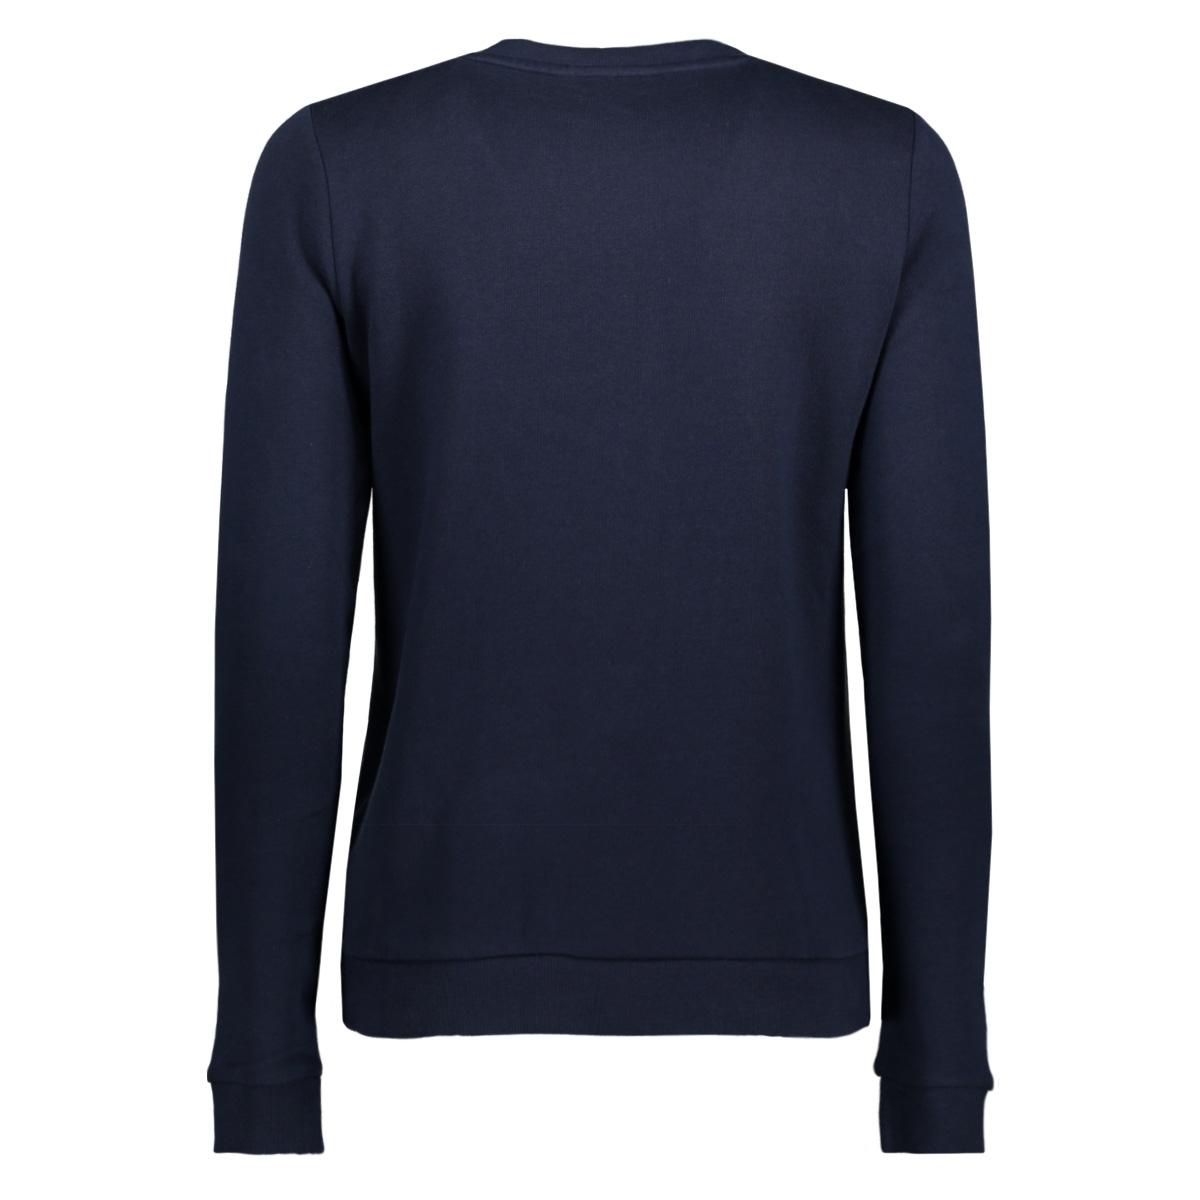 2555073.00.71 tom tailor sweater 6593